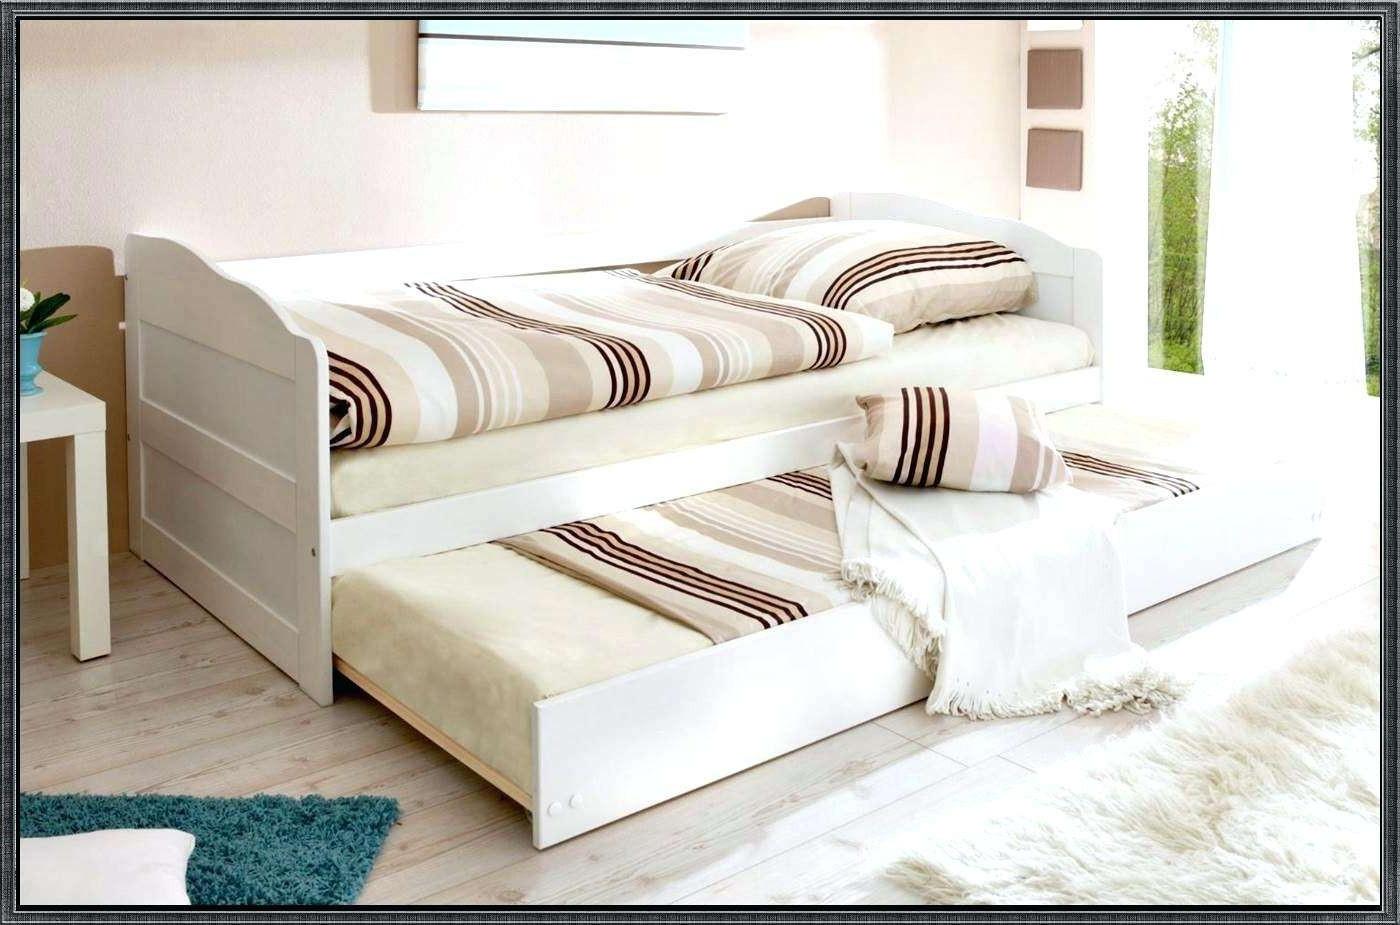 Full Size of Bett Ausklappbar 180x200 Zum Ausklappen Mit Stauraum Klappbar Doppelbett Wand Ausklappbares Schrank Selber Bauen Wandbefestigung Ikea Englisch Sofa Japanisches Bett Bett Ausklappbar